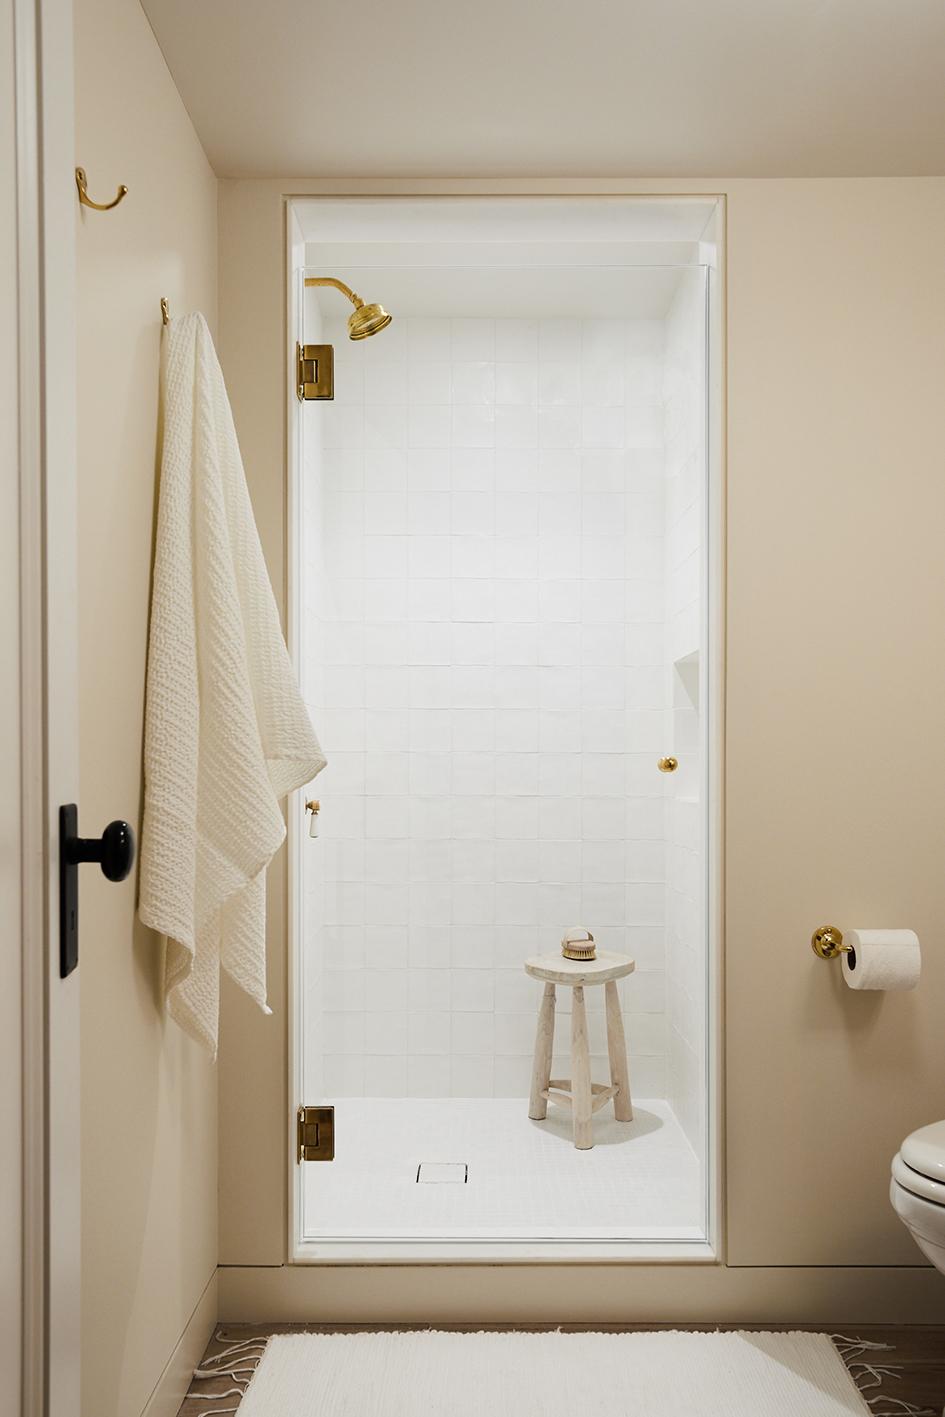 zz. Garden Bathroom Slope_Townhouse_Bathroom_Ground_Floor_033_edit.jpg